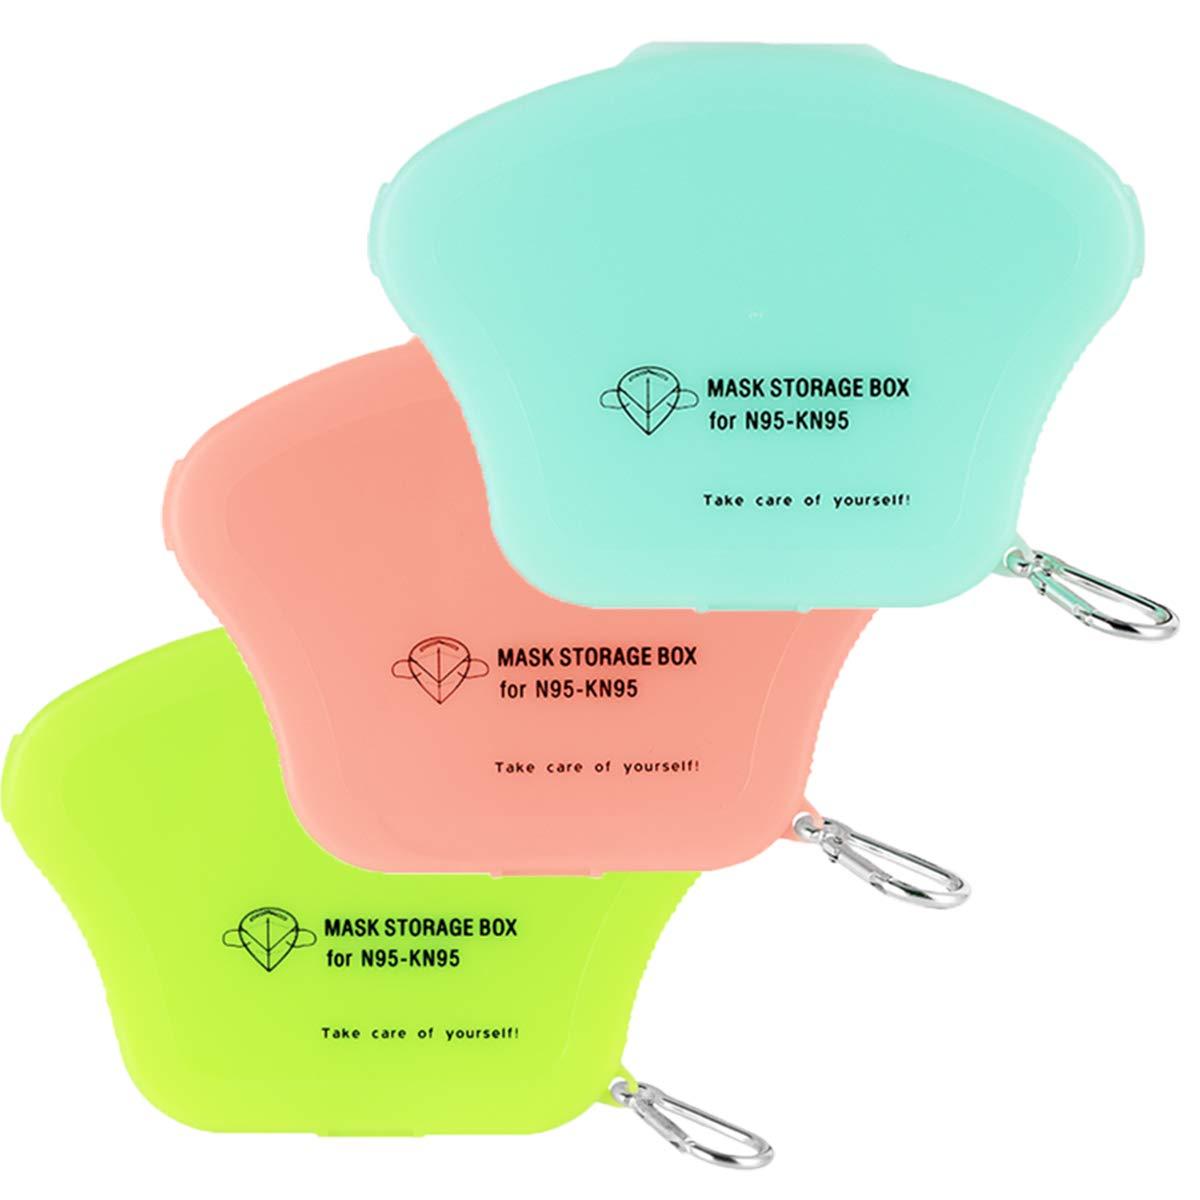 3Pcs Mask Storage Clip Holder Face Masks Case Foldable Storage Bag Portable Plastic Mask Storage Box Disposable Face Masks Organizer Dustproof Storage Box for Mask Pollution Prevention Set